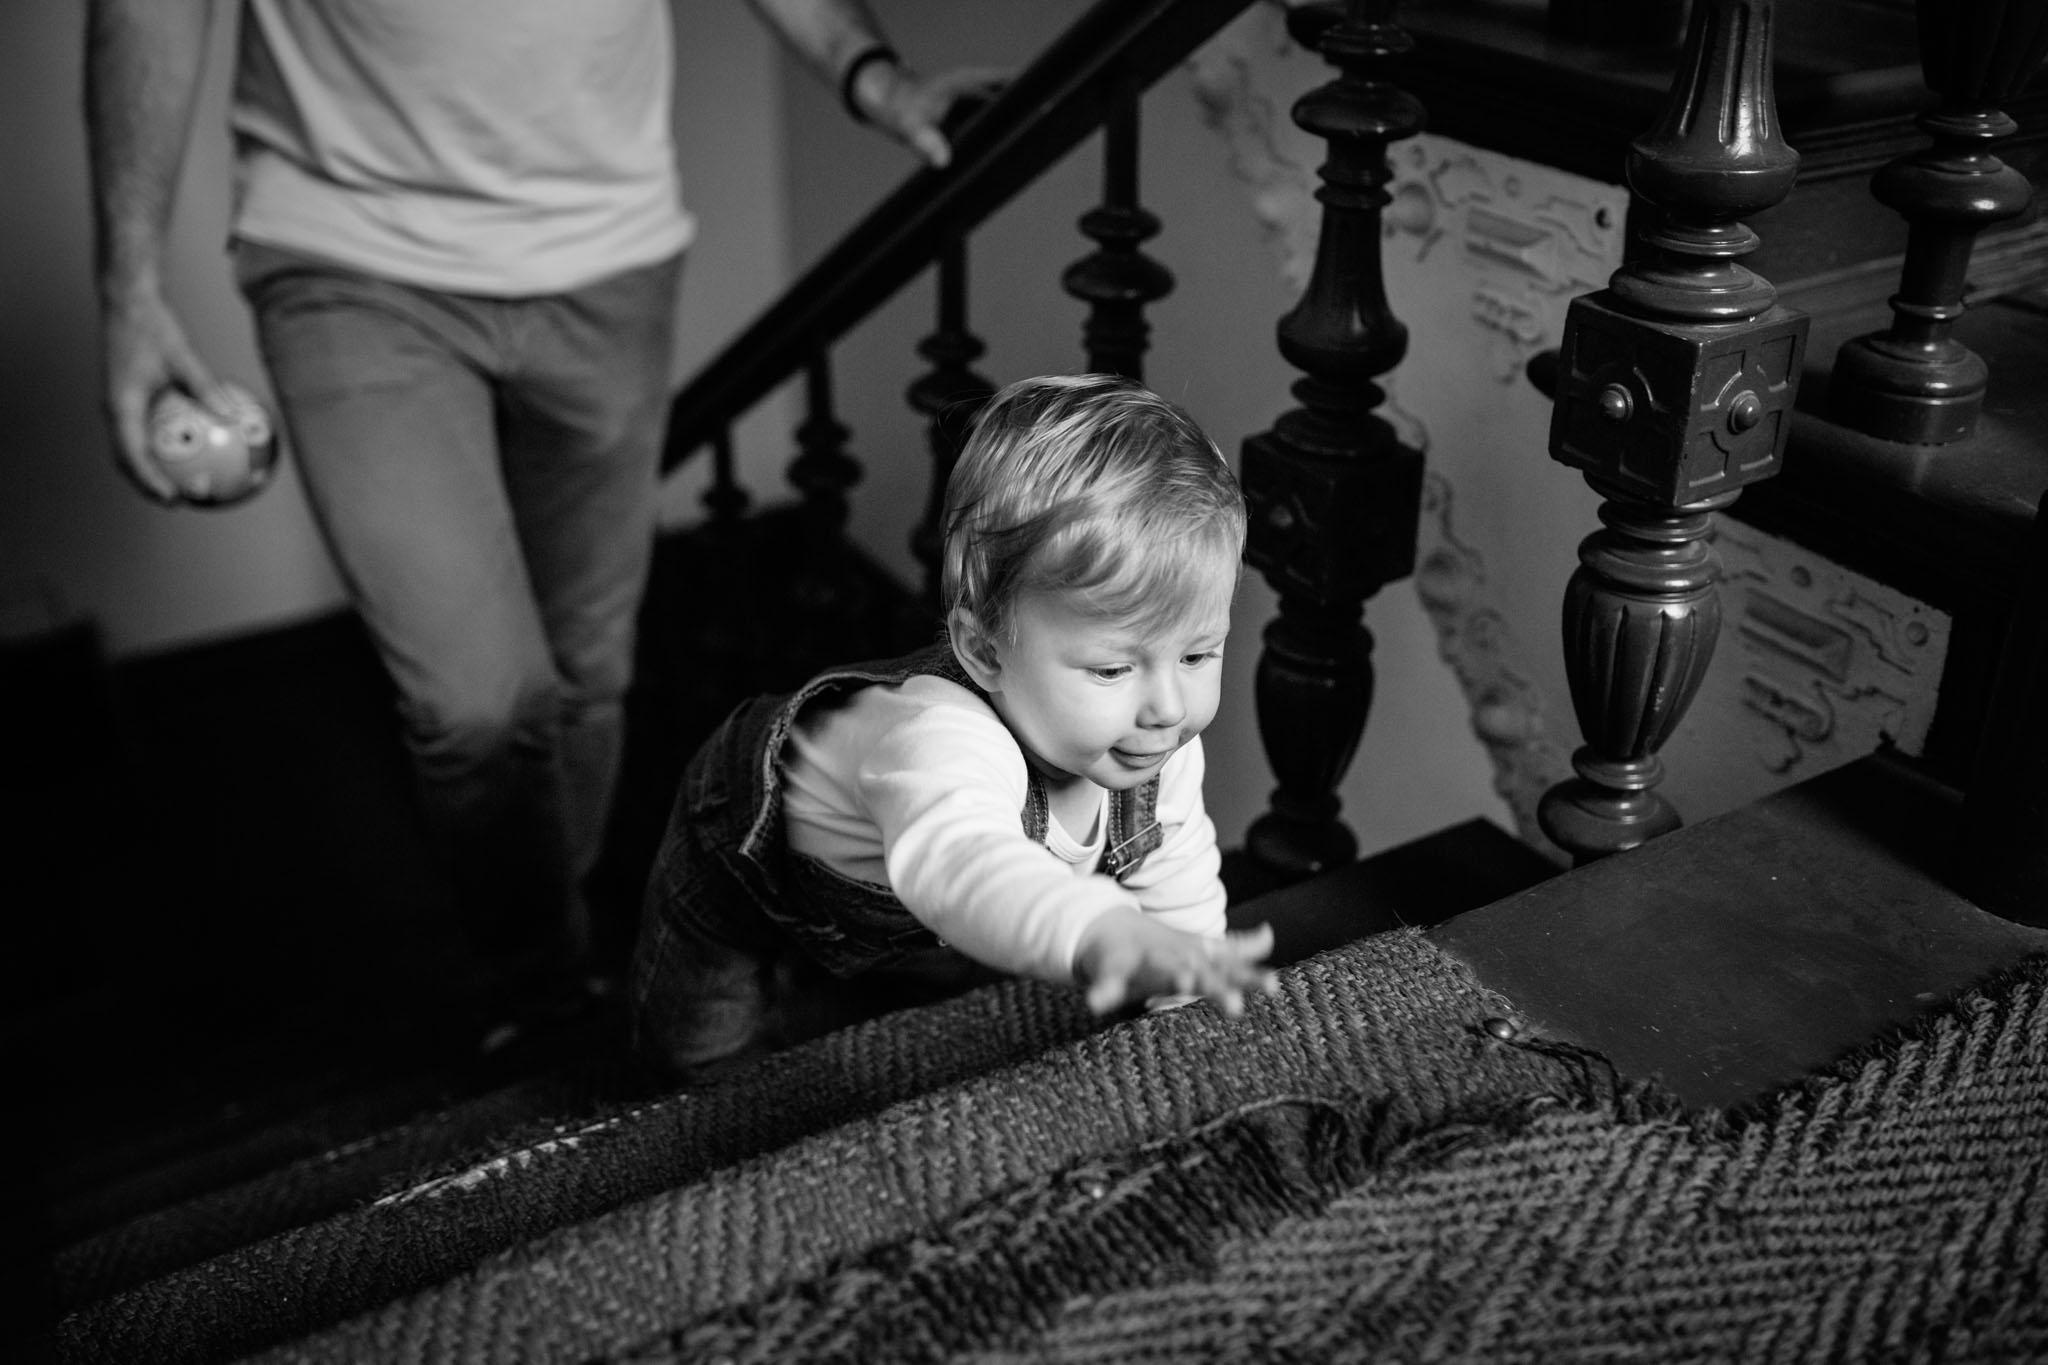 familien-fotografie-berlin-kreuzberg-treppe-schwarzweiss